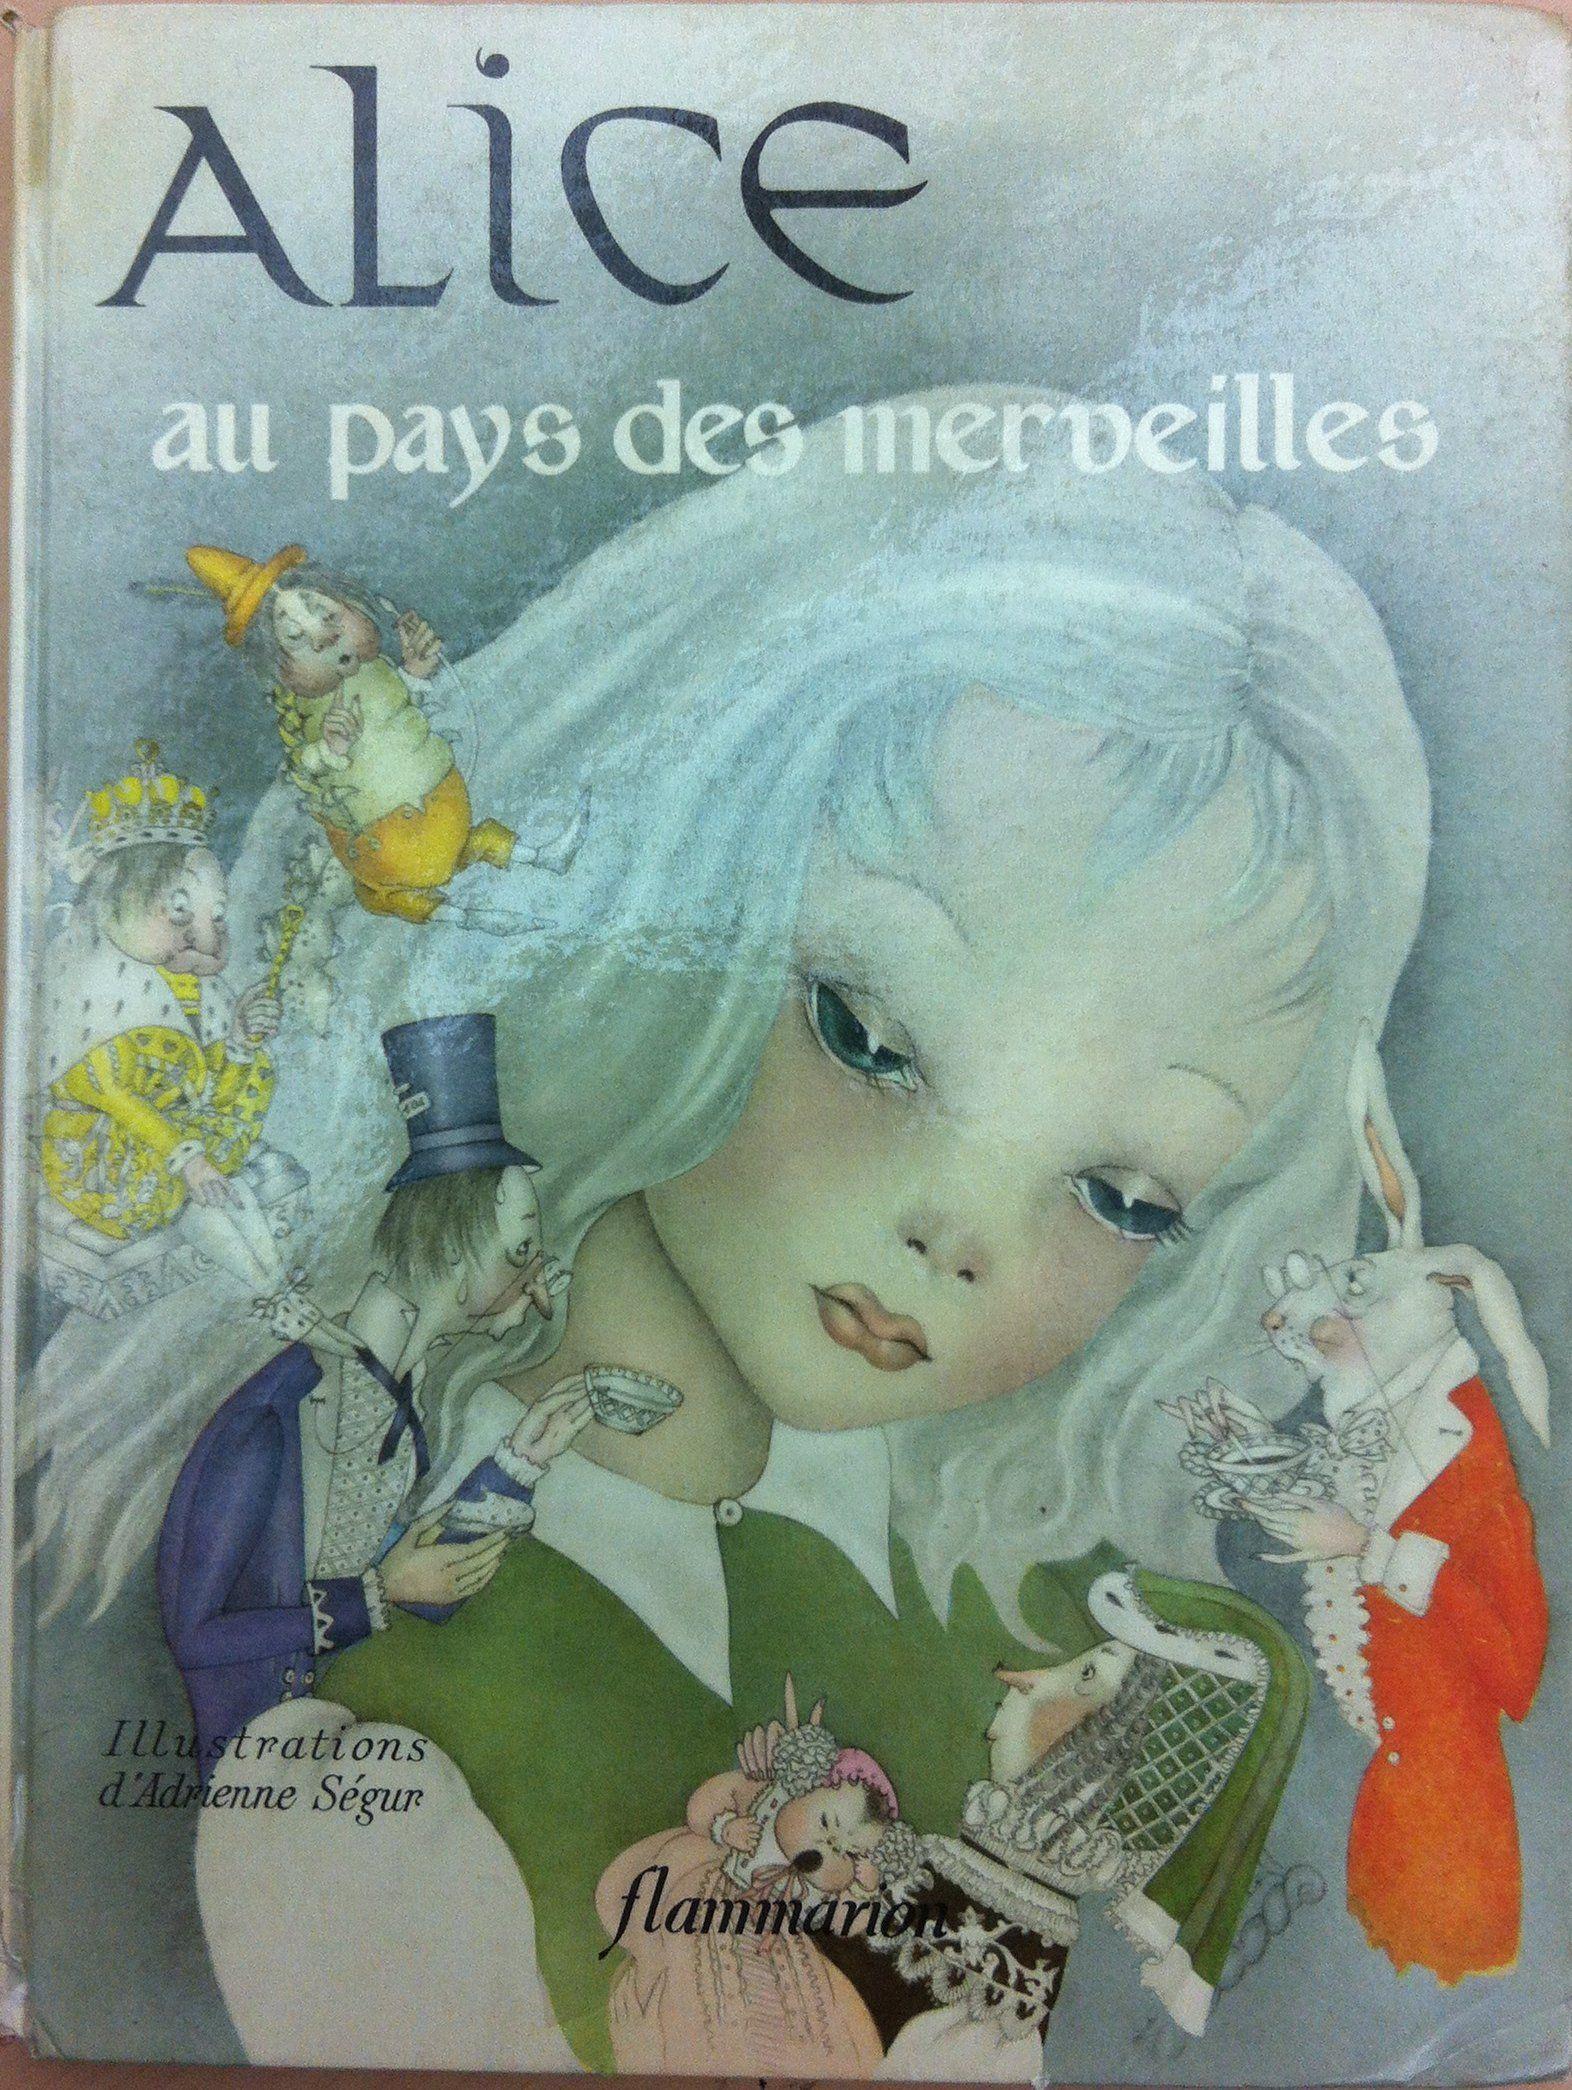 Alice in wonderland info-5197